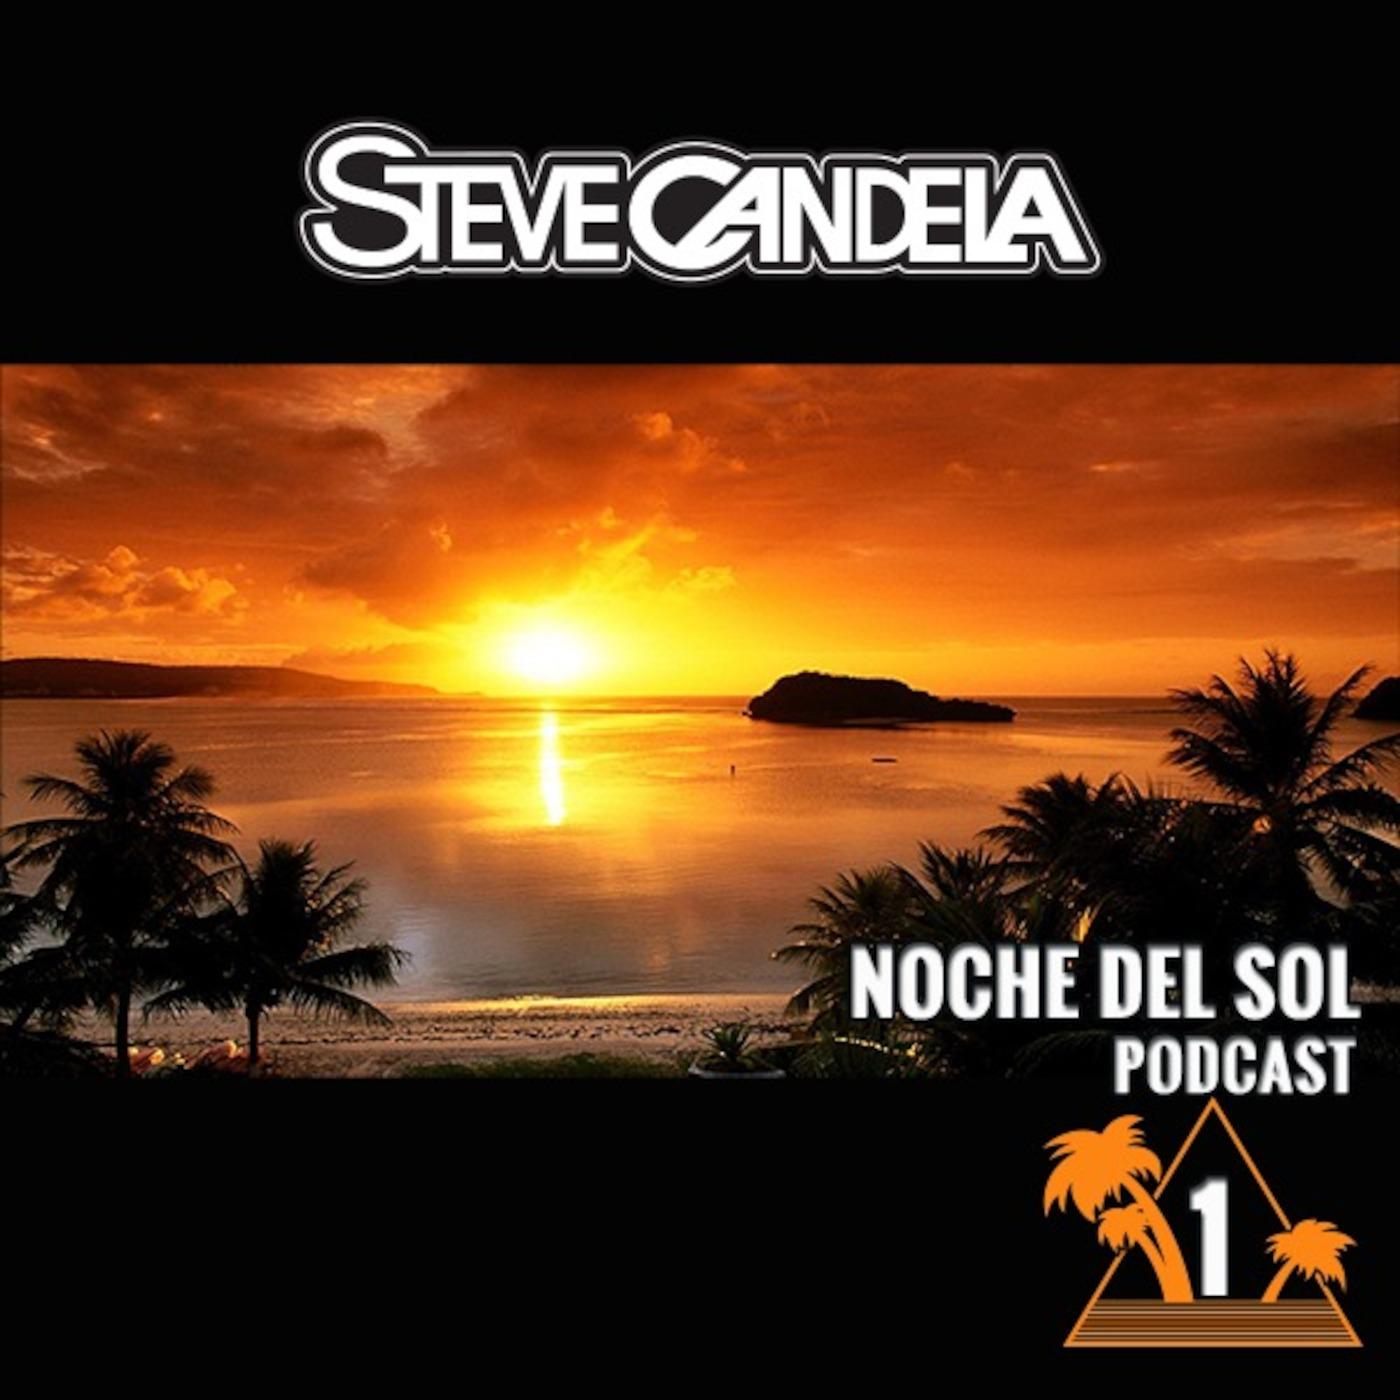 Steve Candela's Noche Del Sol Podcast